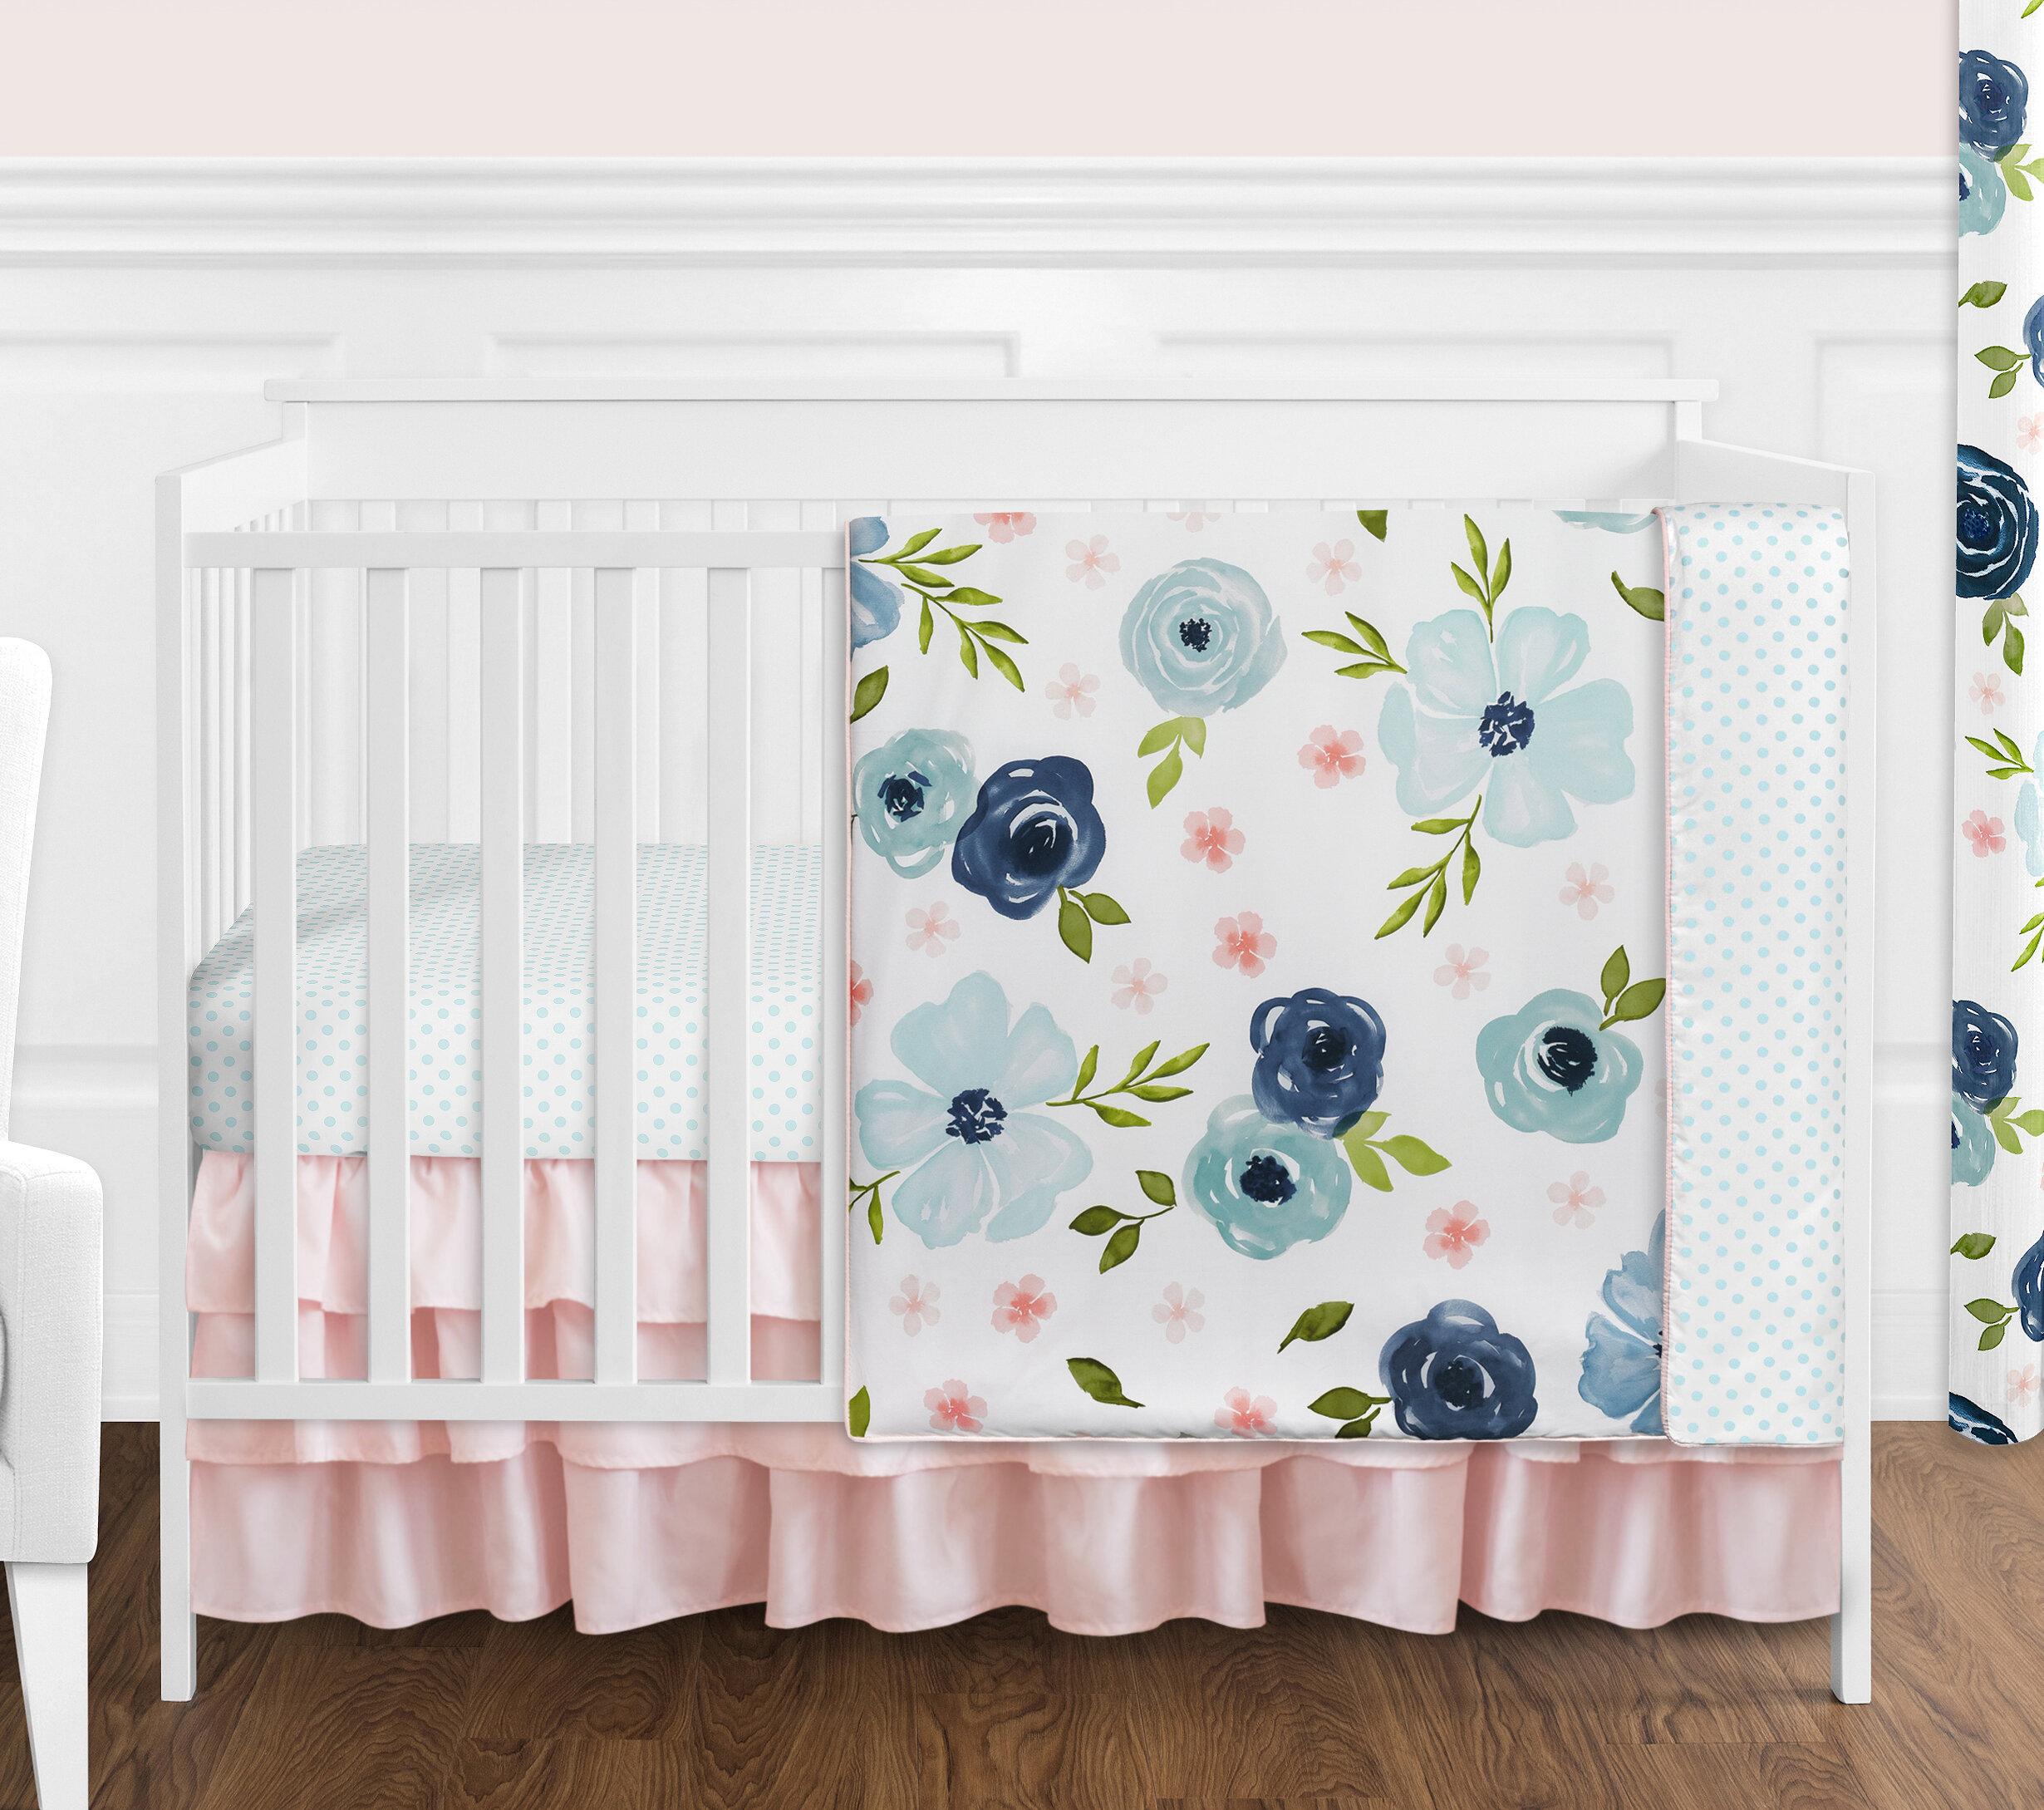 Sweet Jojo Designs 4 Piece Crib Bedding Set Reviews Wayfair